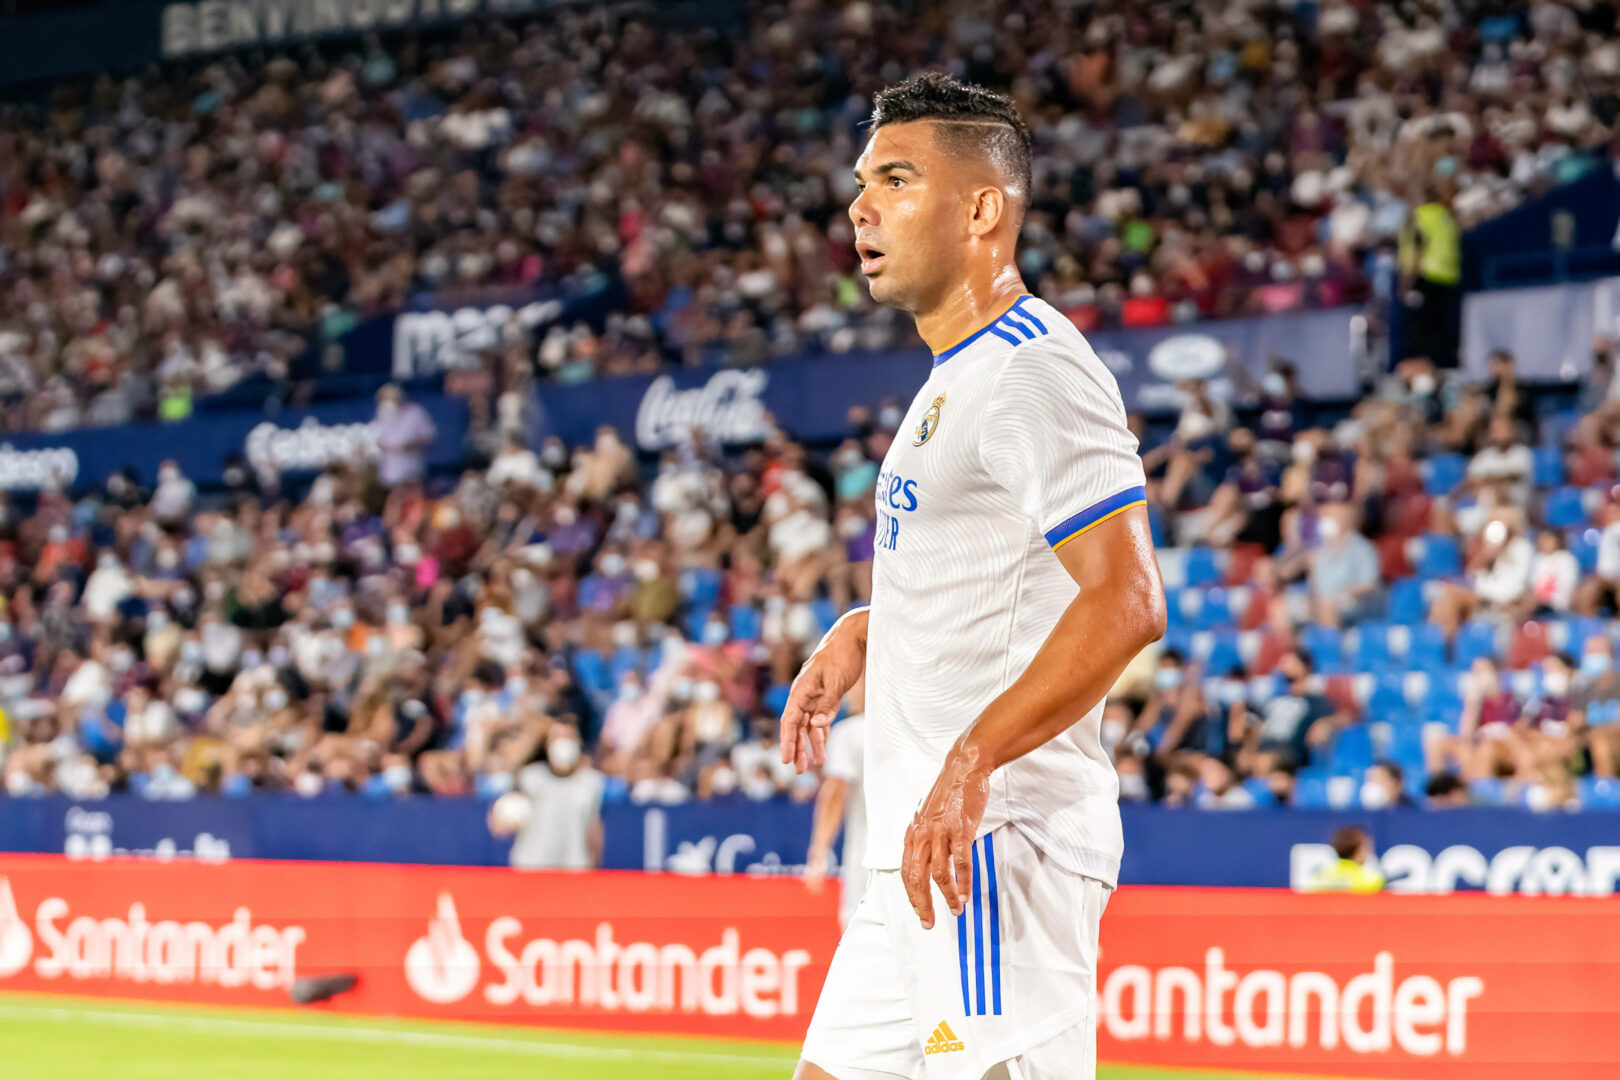 Real Madrid bestätigt: Casemiro verlängert Vertrag vorzeitig!